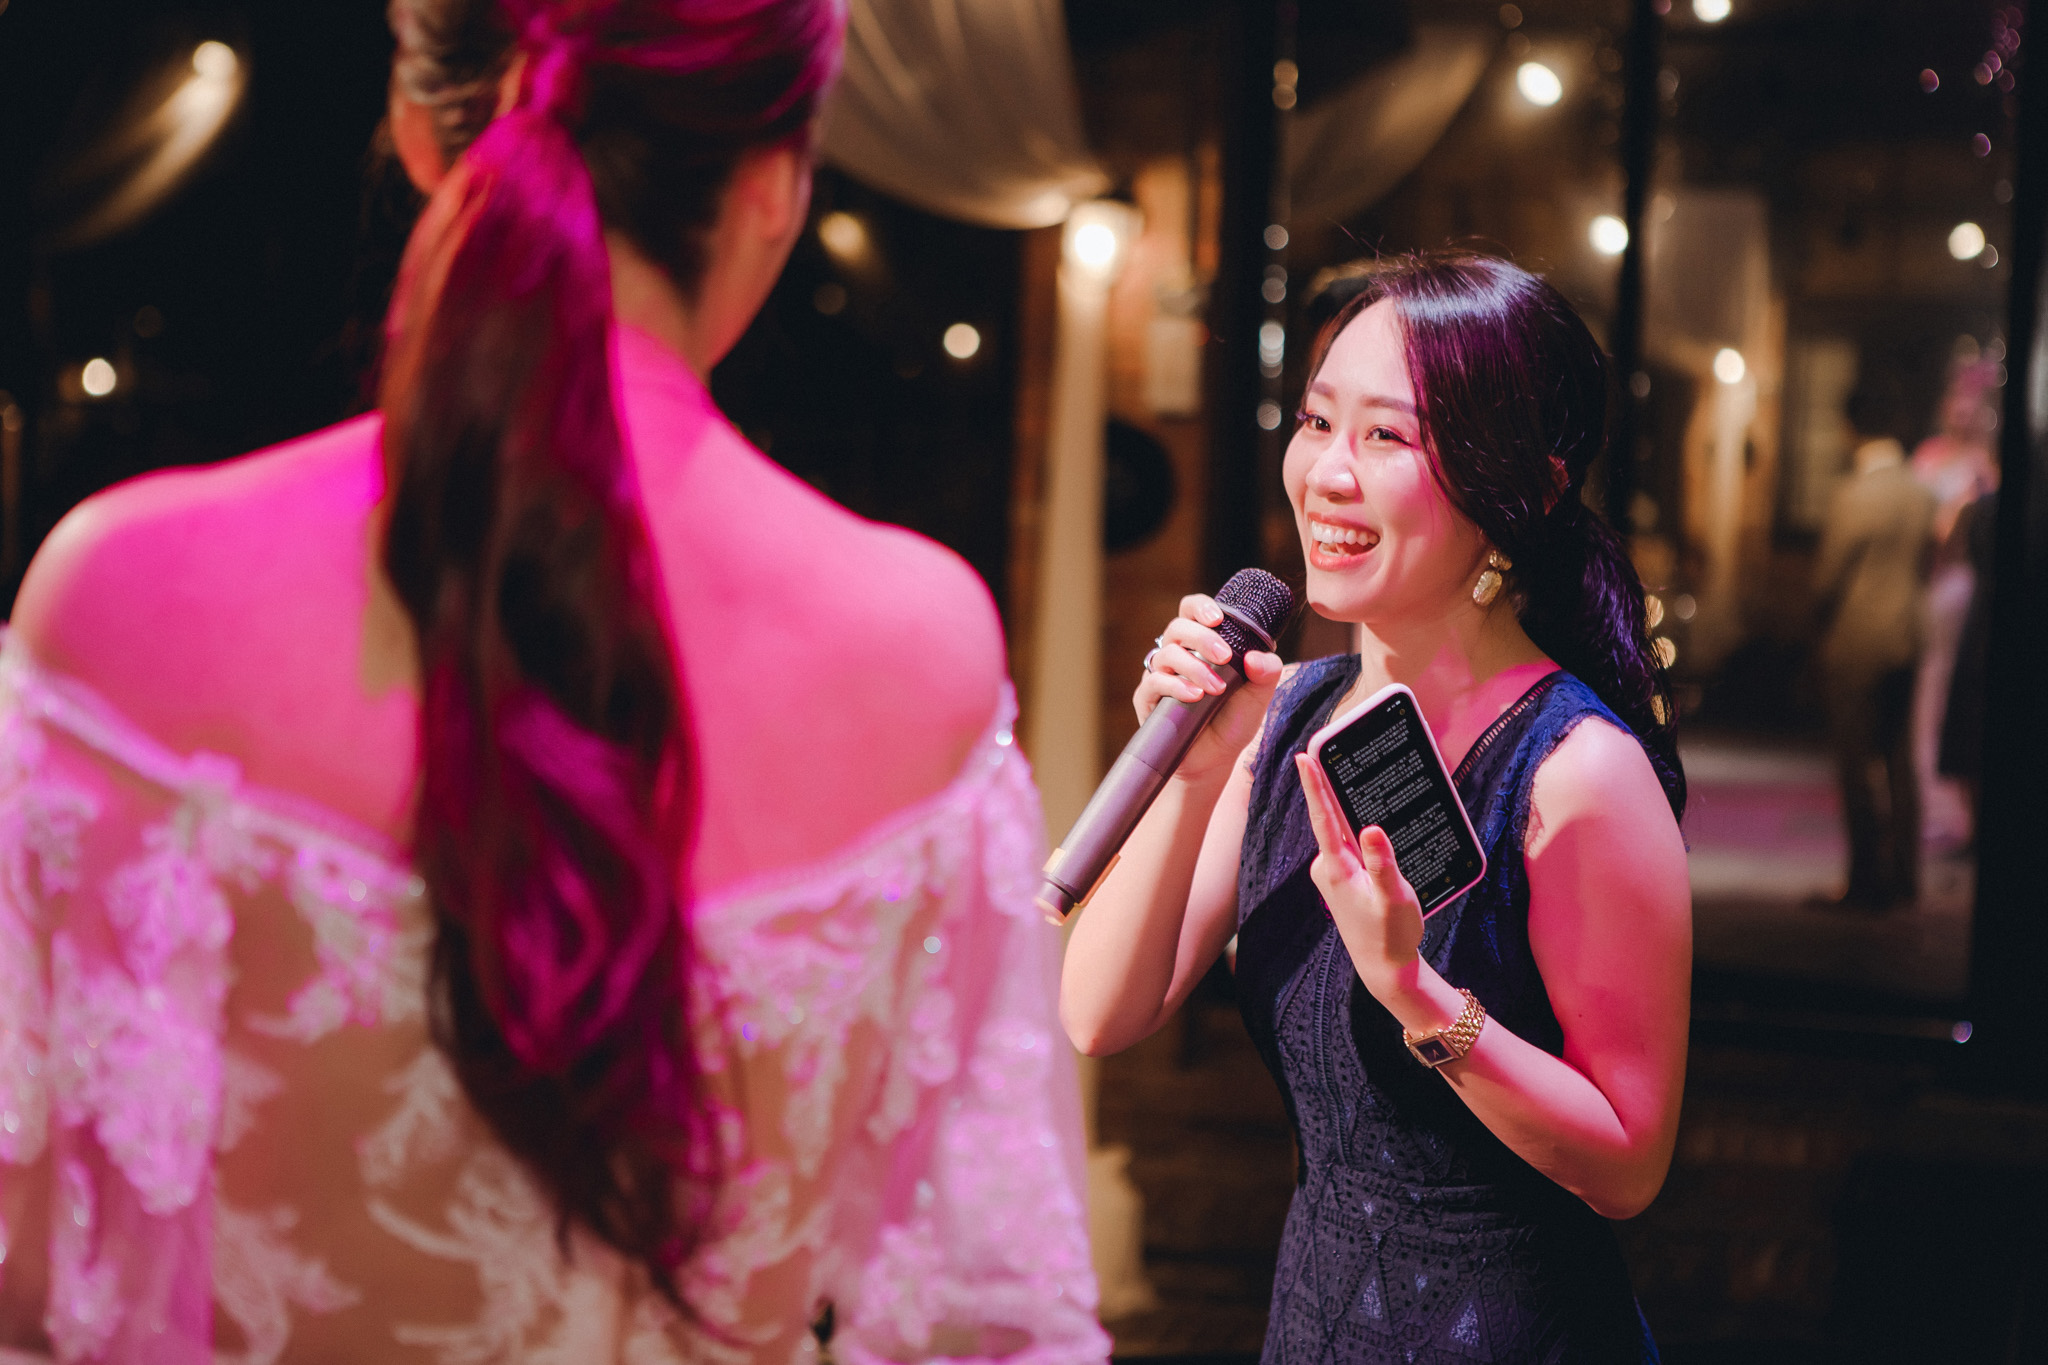 EW 台北婚攝 居米 濟南教會 Brick Yard 33 美軍俱樂部 婚禮 婚宴-102